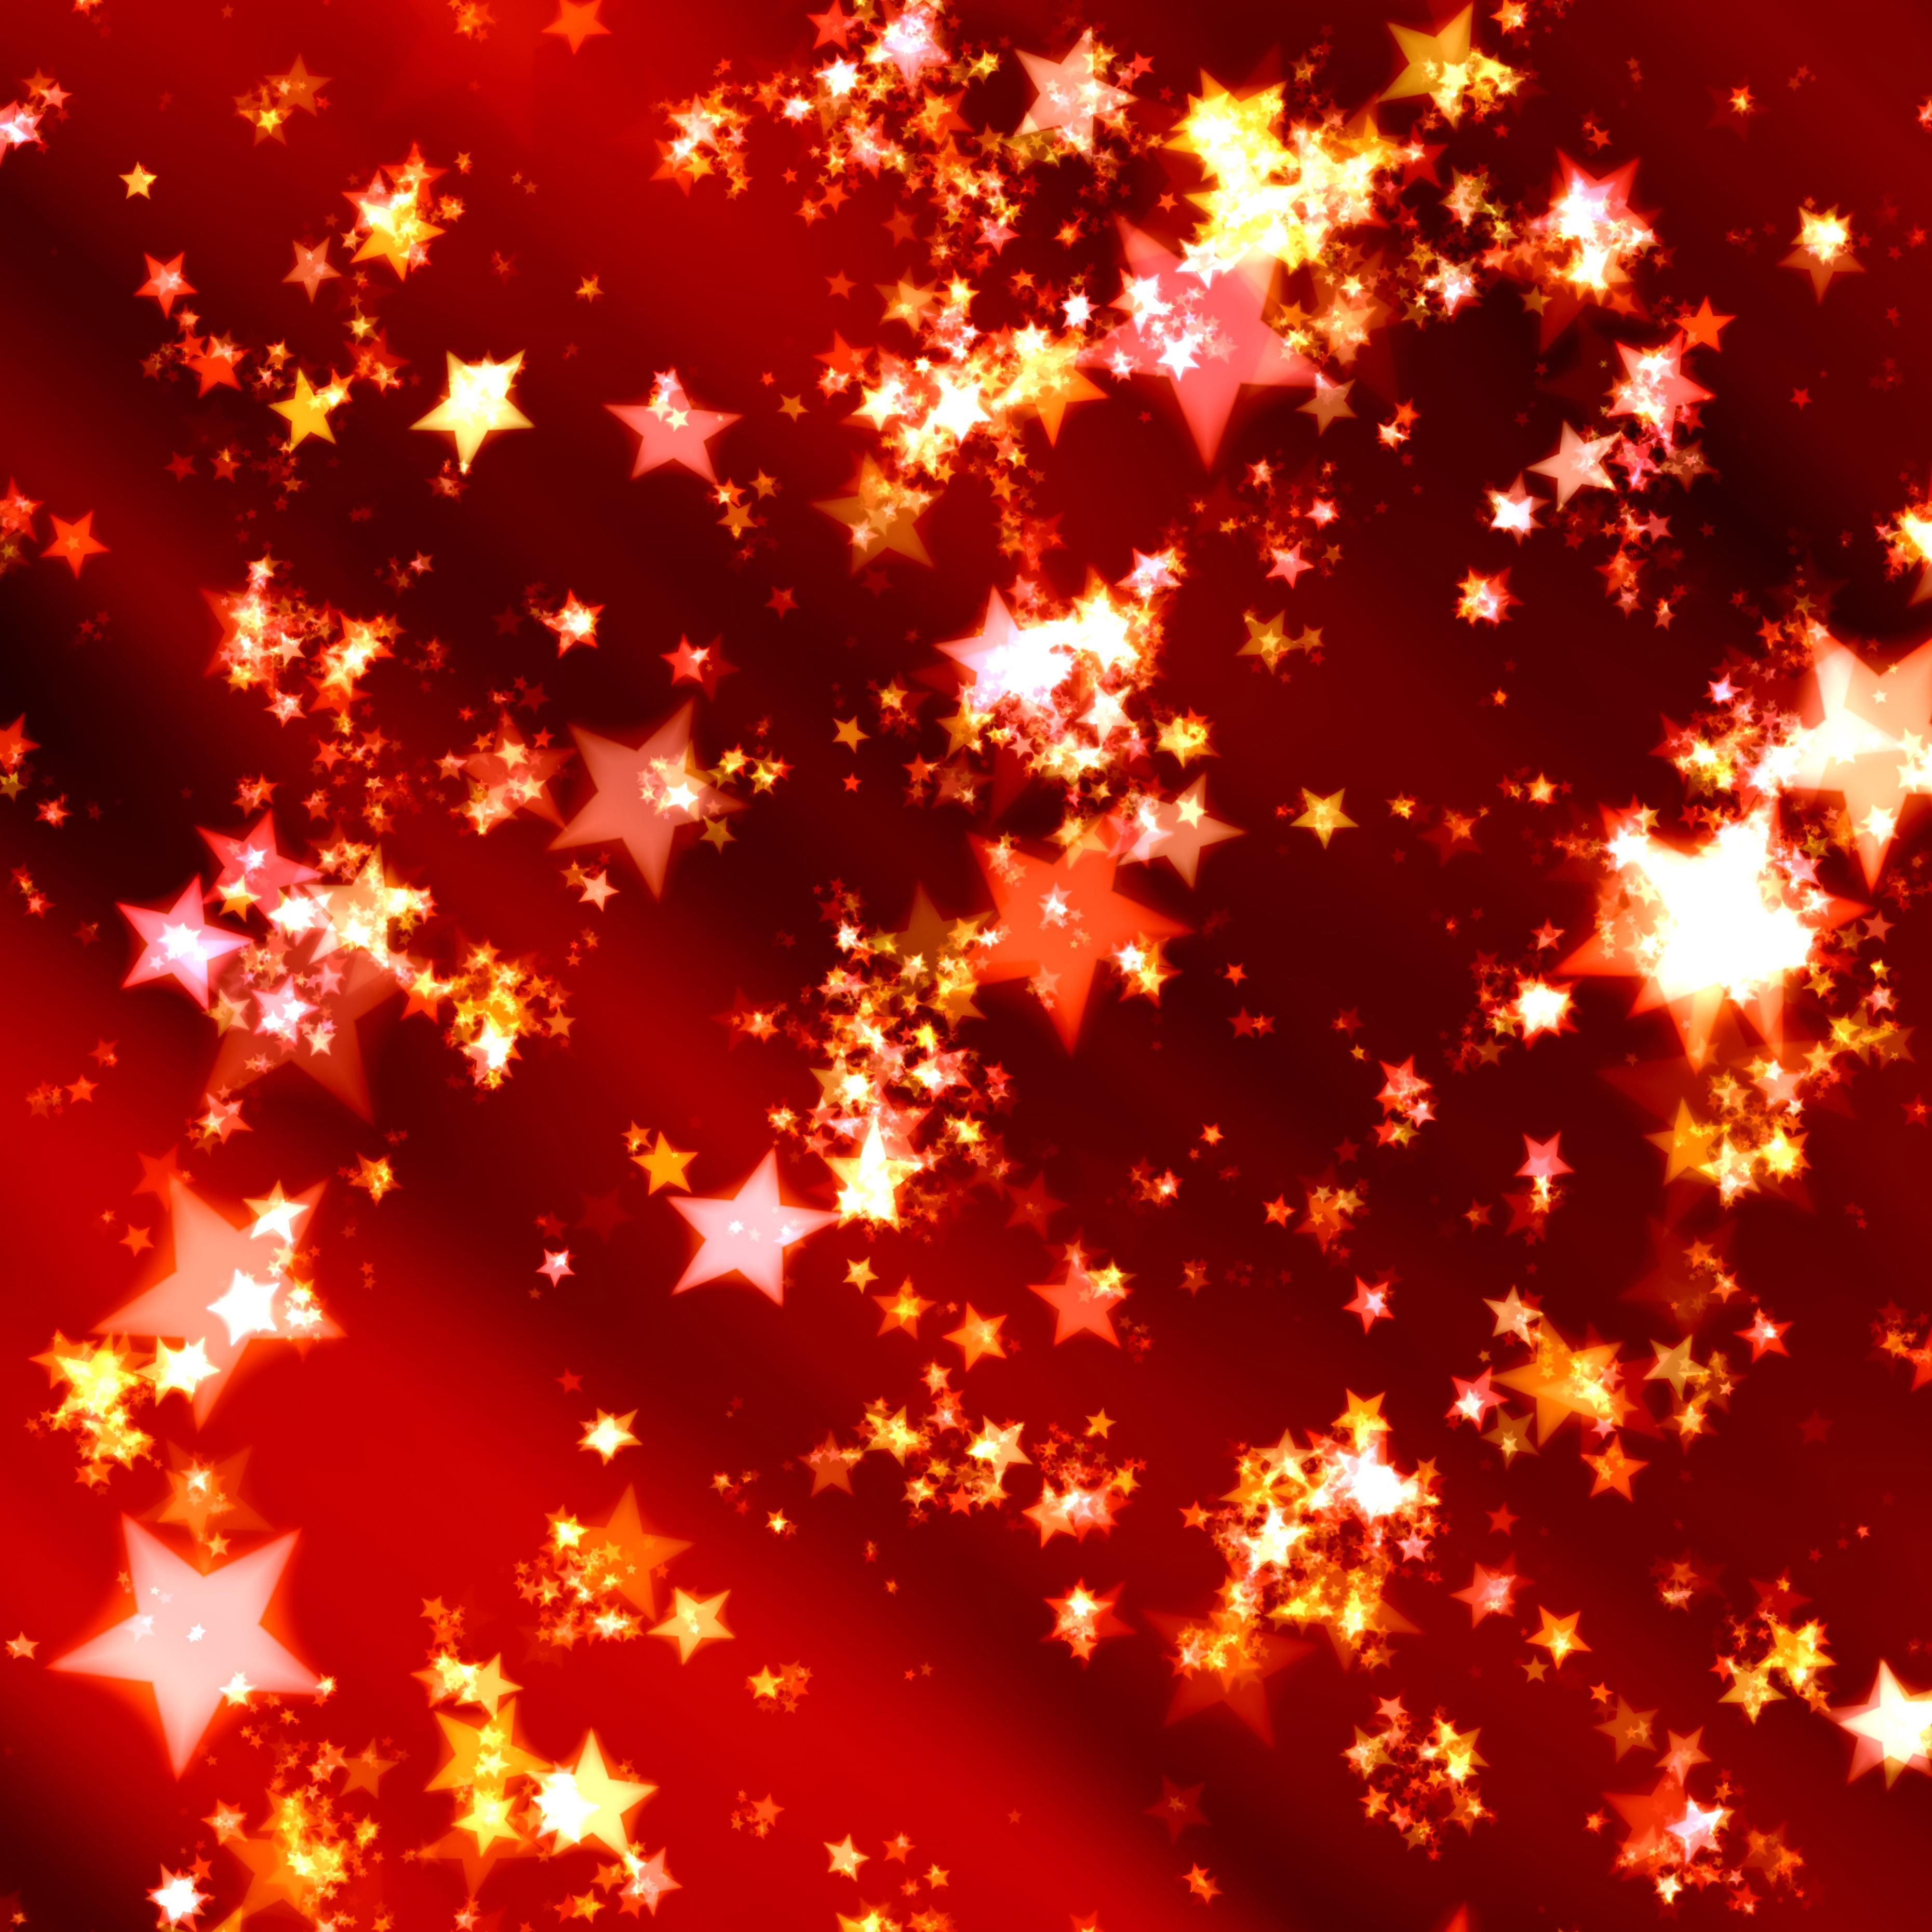 Red Stars Background 35 Stars at Xmas Backg...